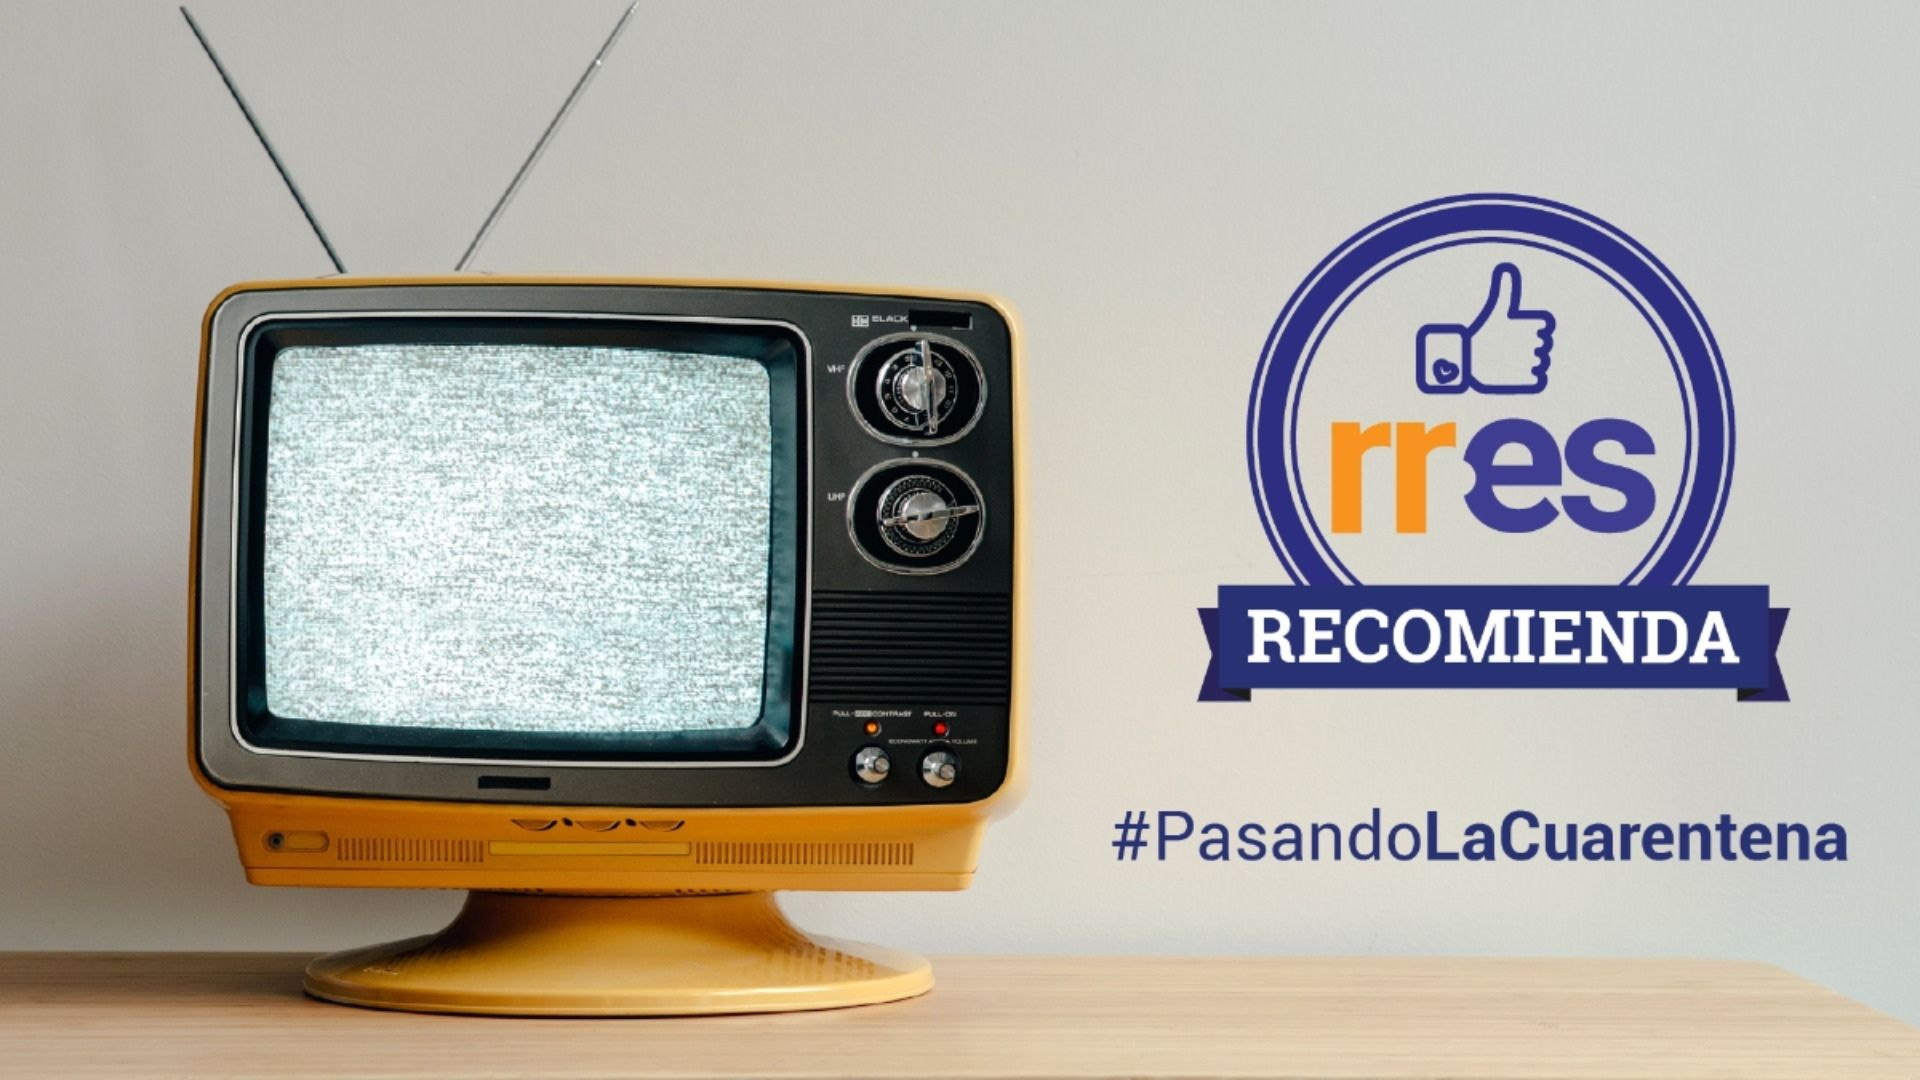 #PasandoLaCuarentena | Festival de Cine Alemán se realizará en línea